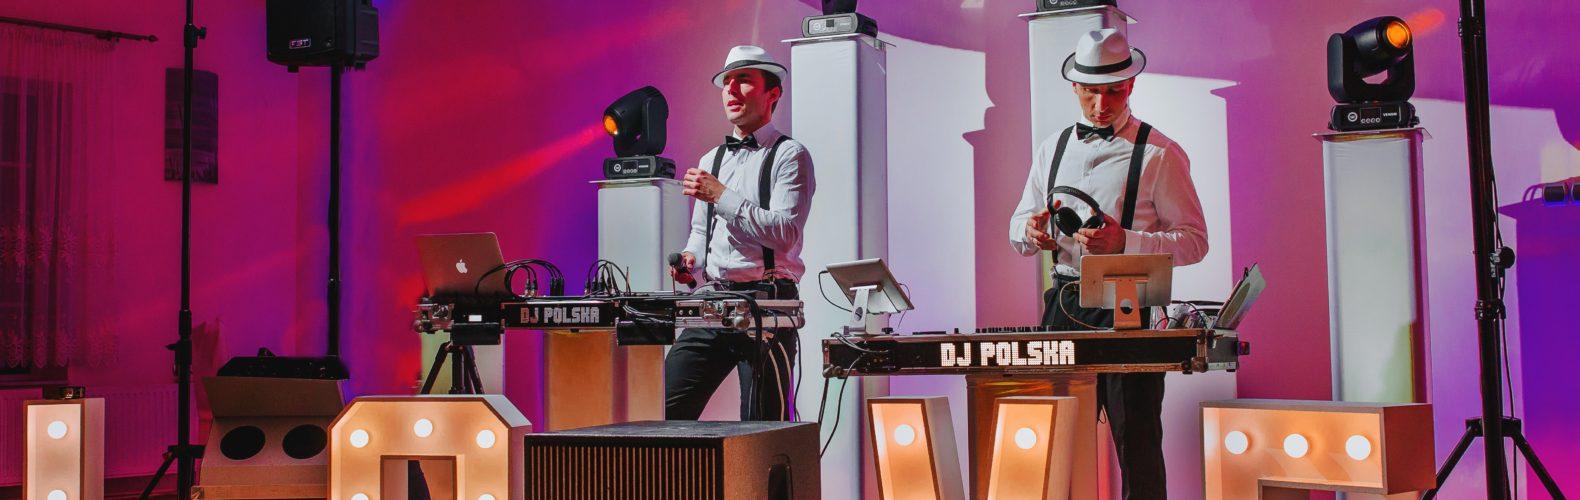 dj polska Poznań